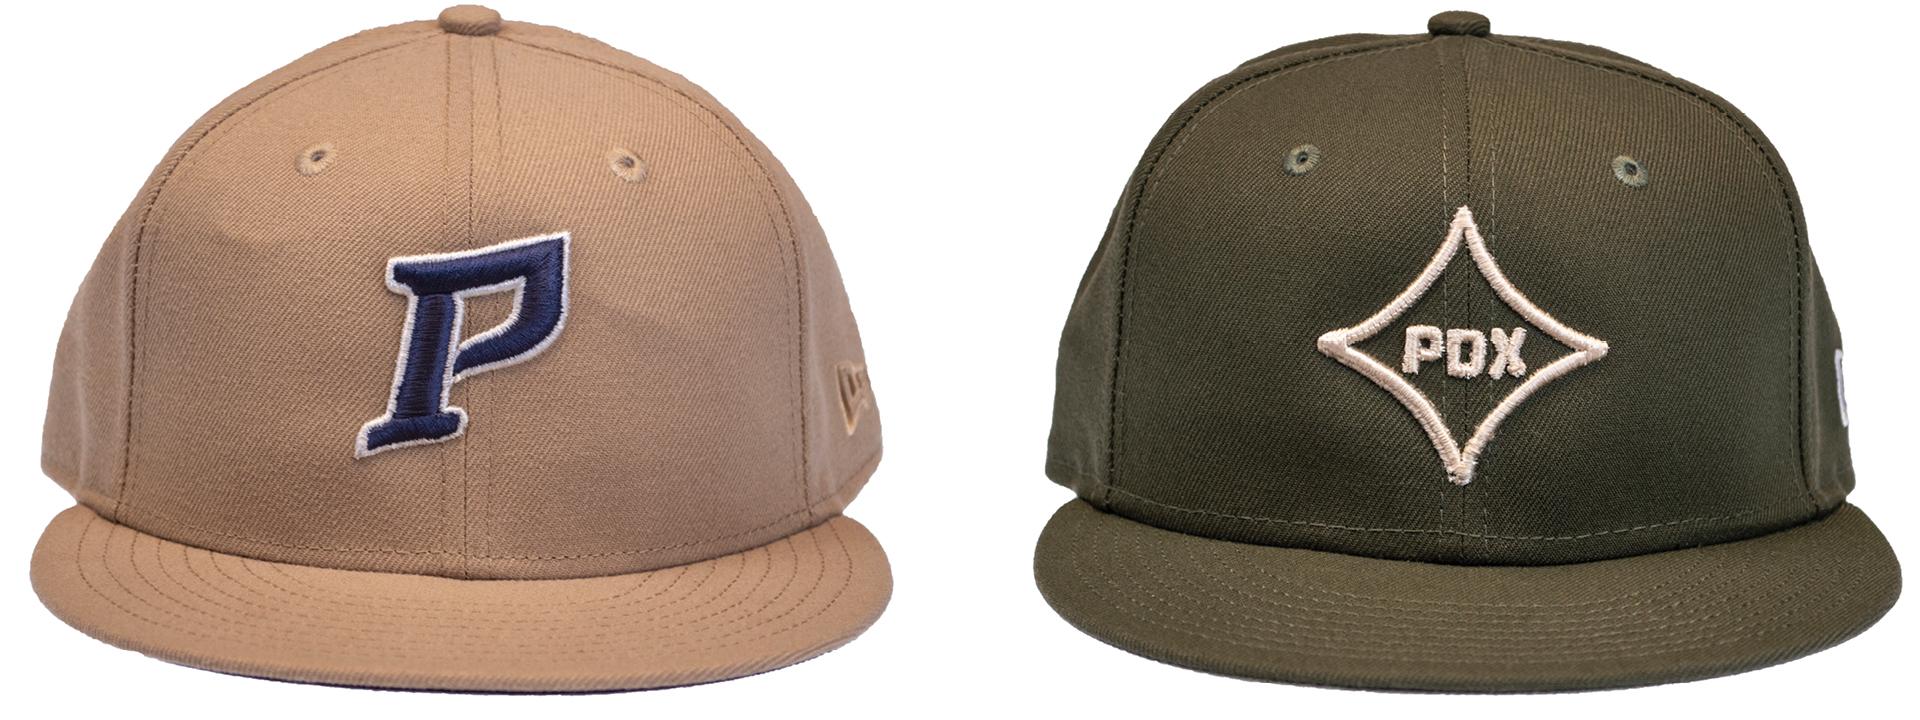 15 Hats.jpg